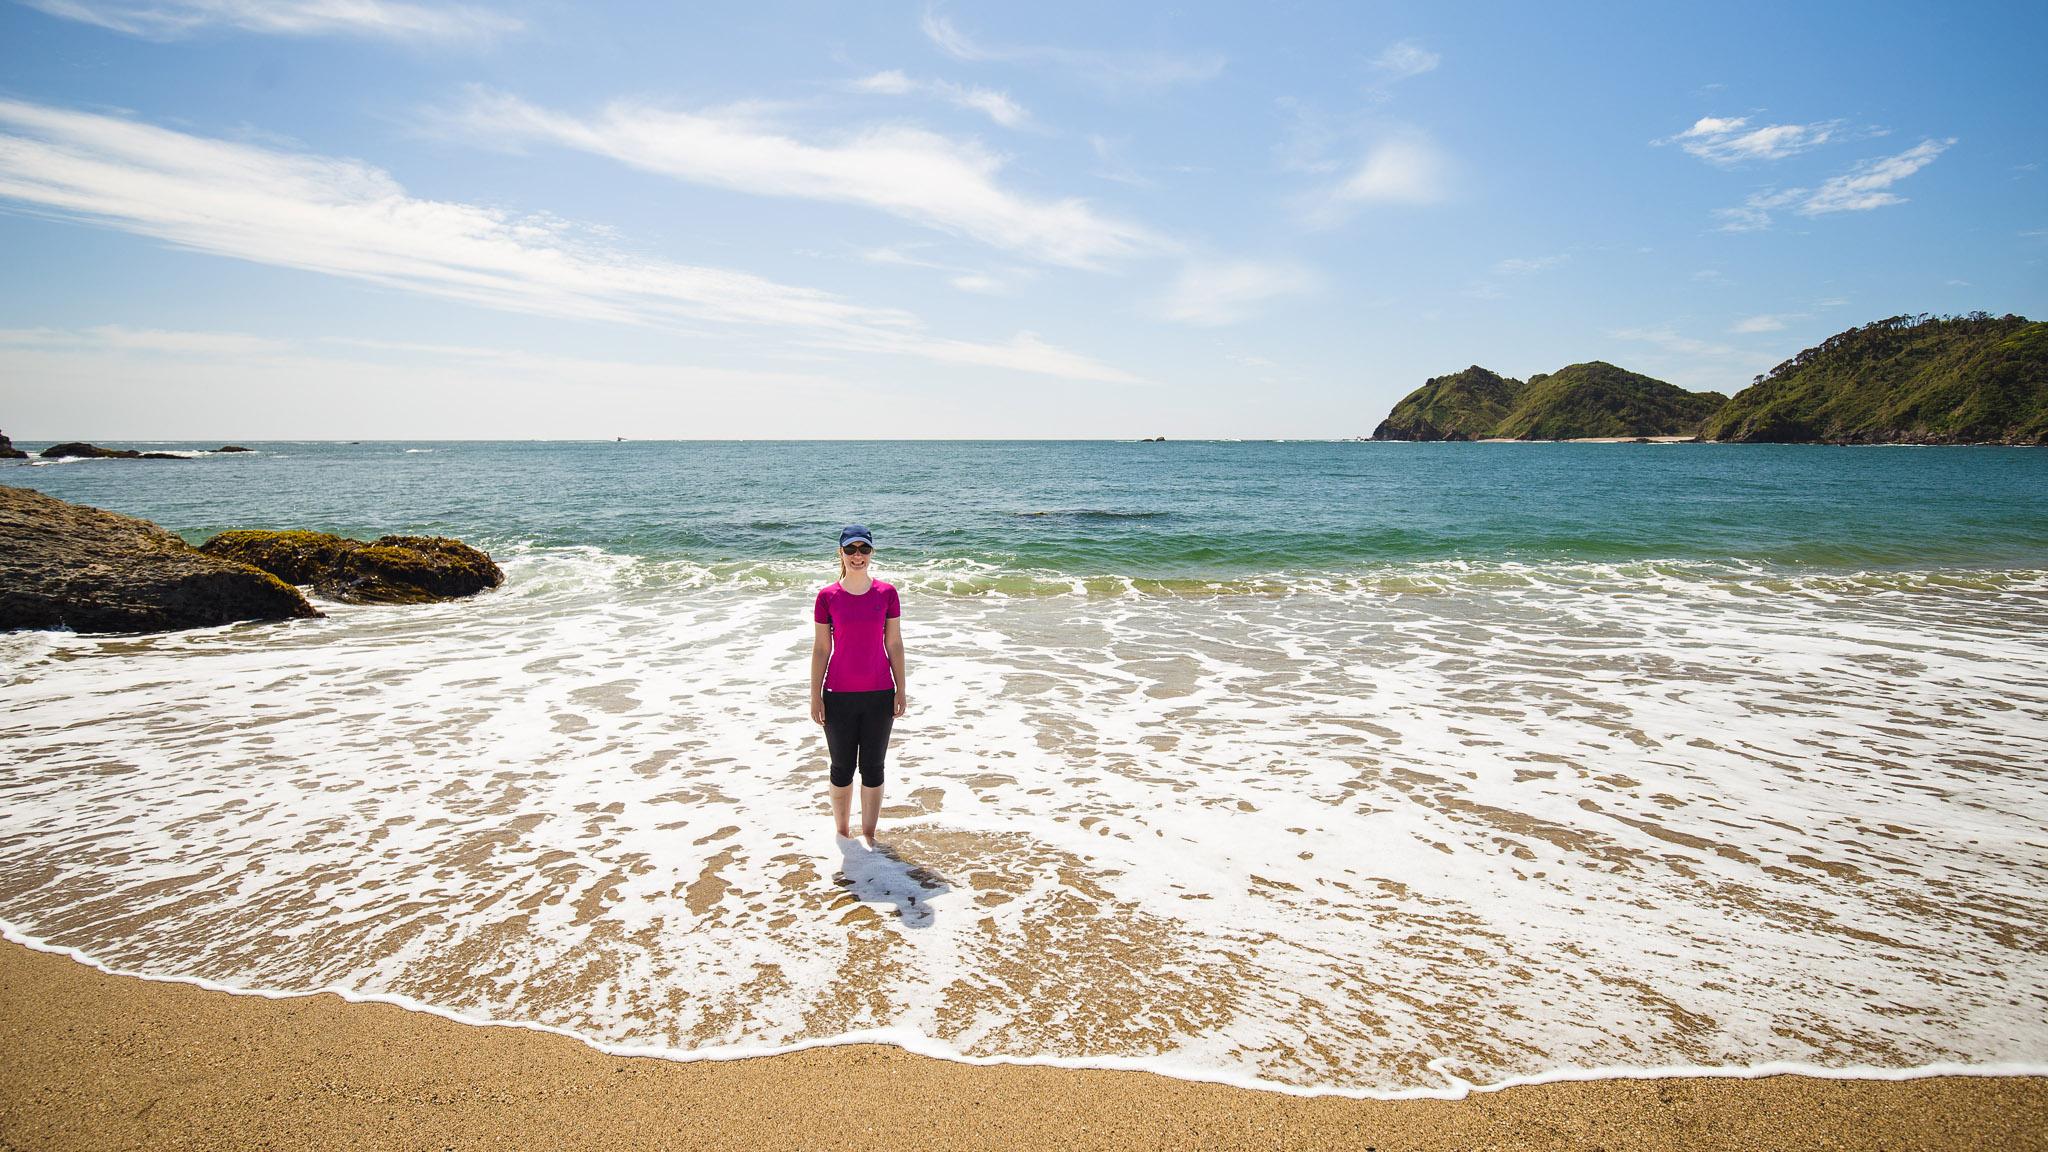 chile-chiloe-beach-ocean-colecole-2